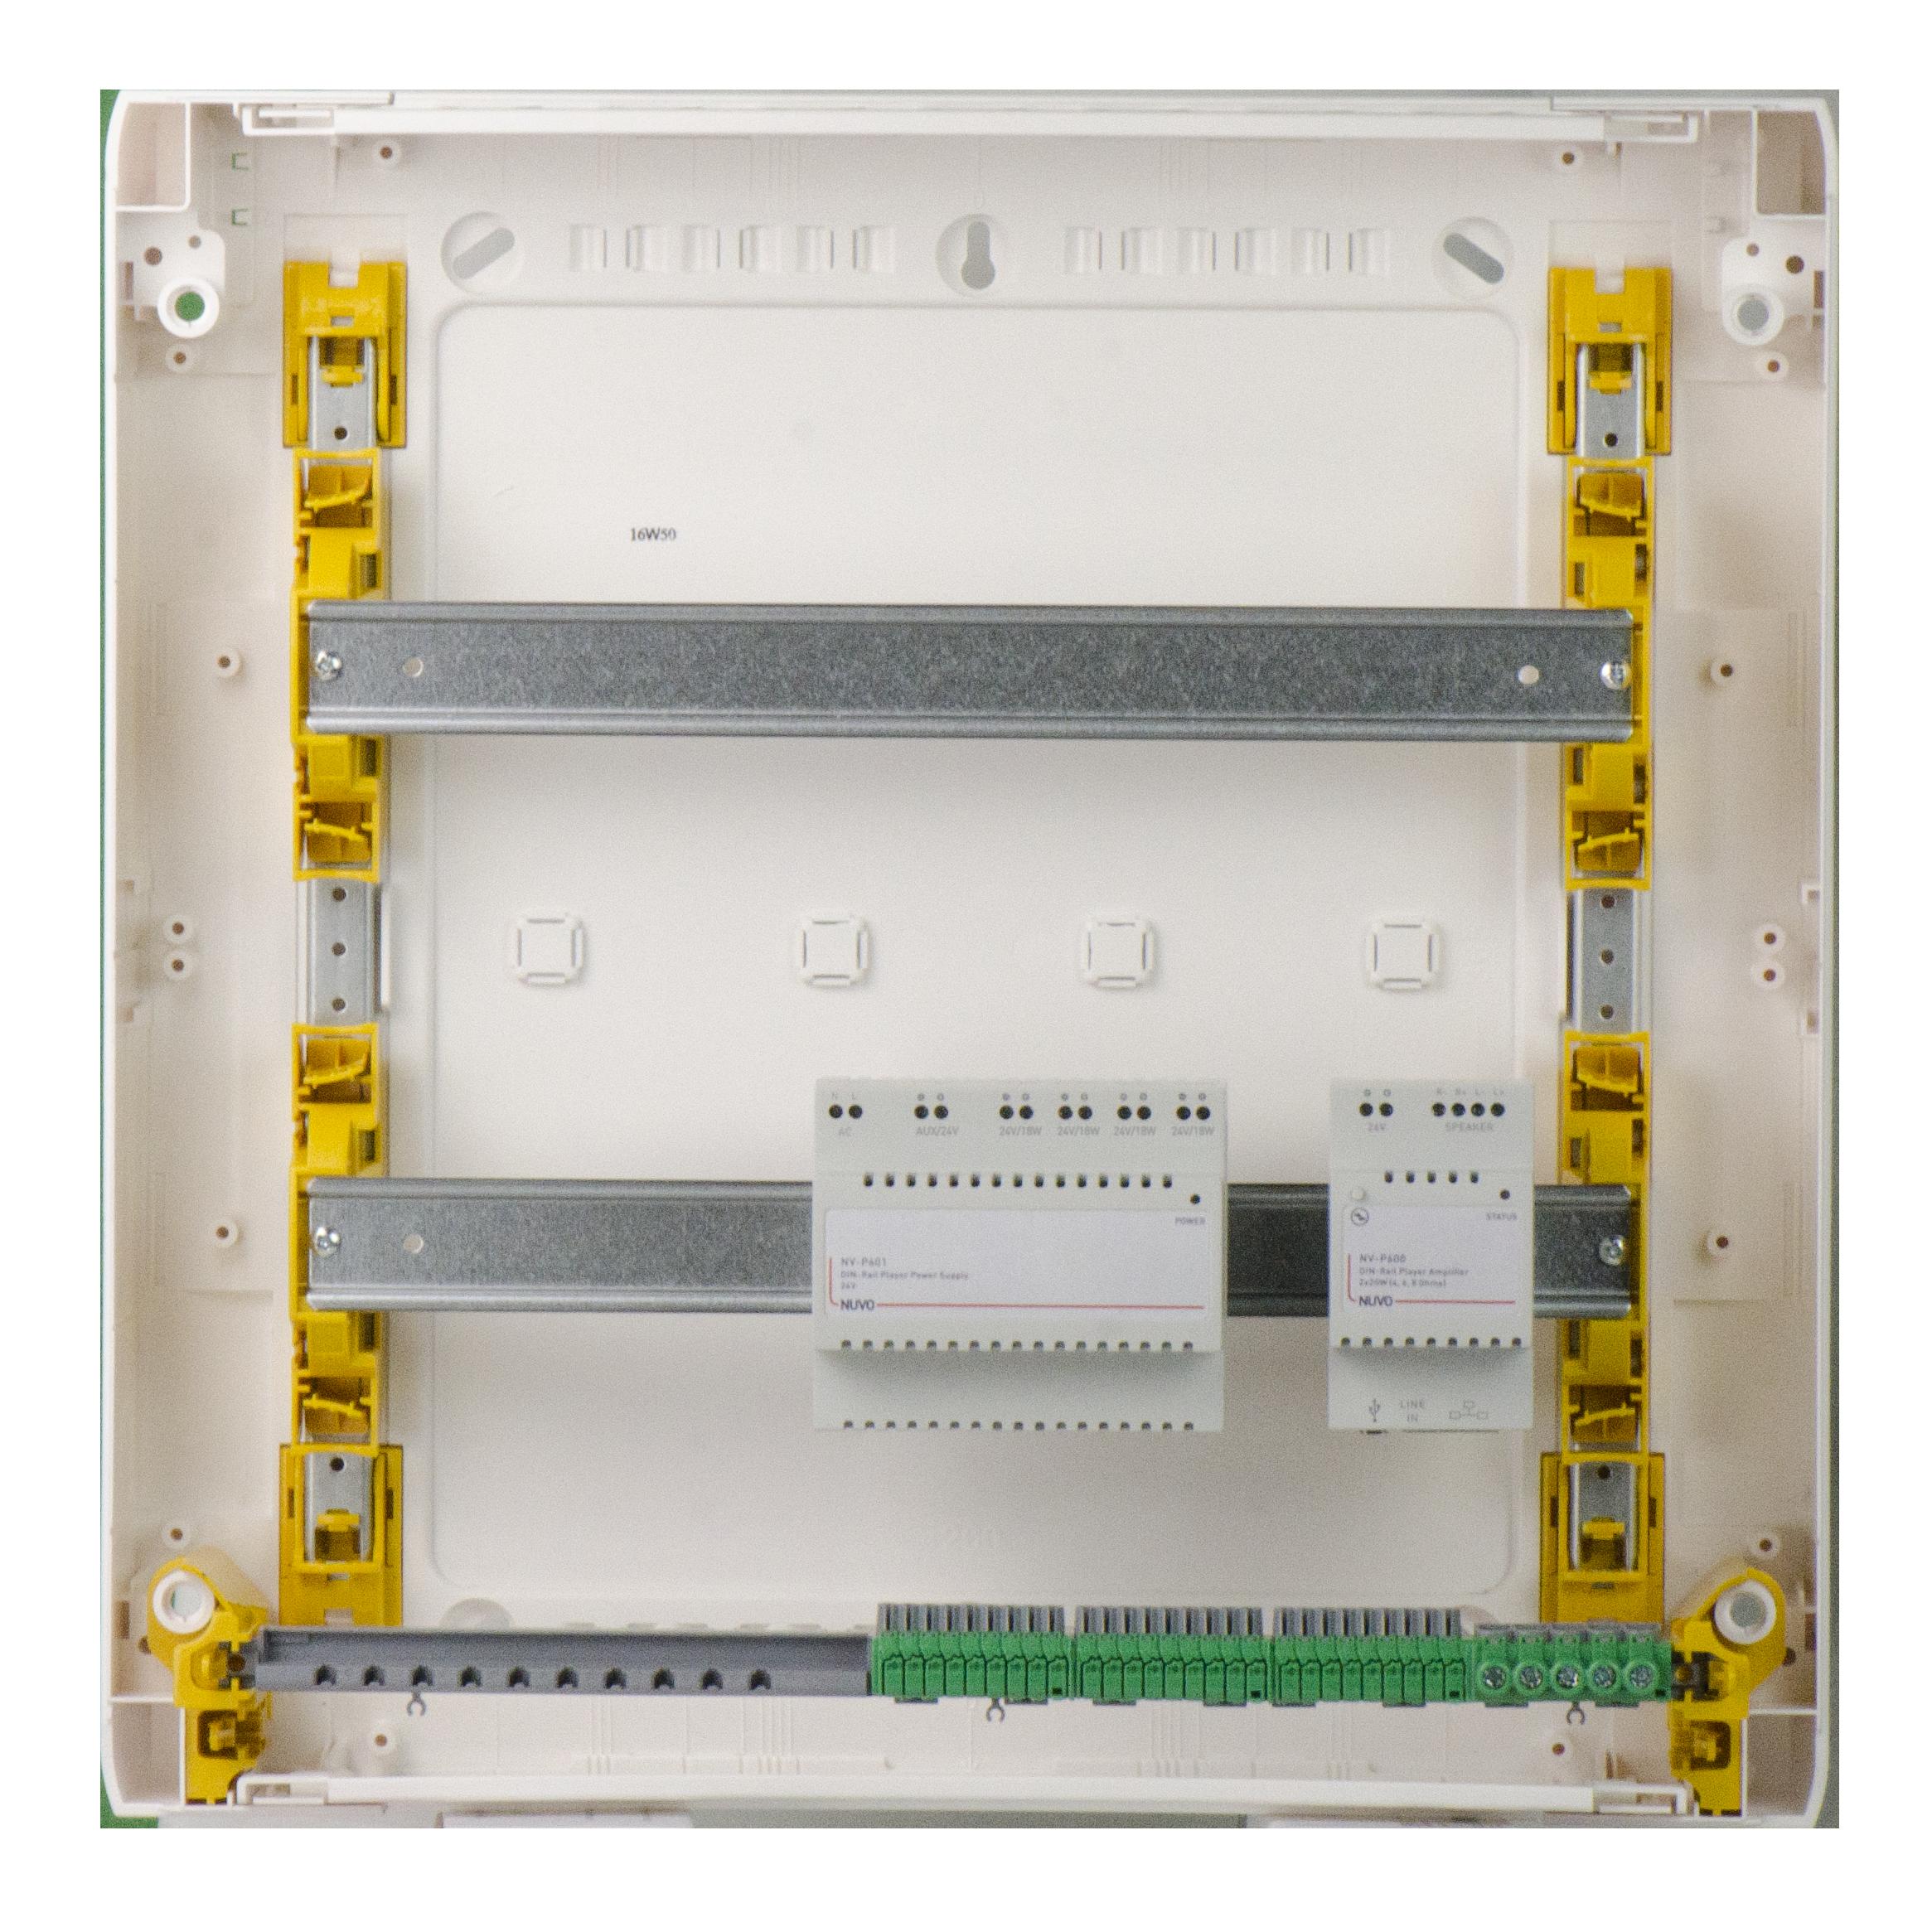 NV-P600 NV-P601 in Enclosure Open